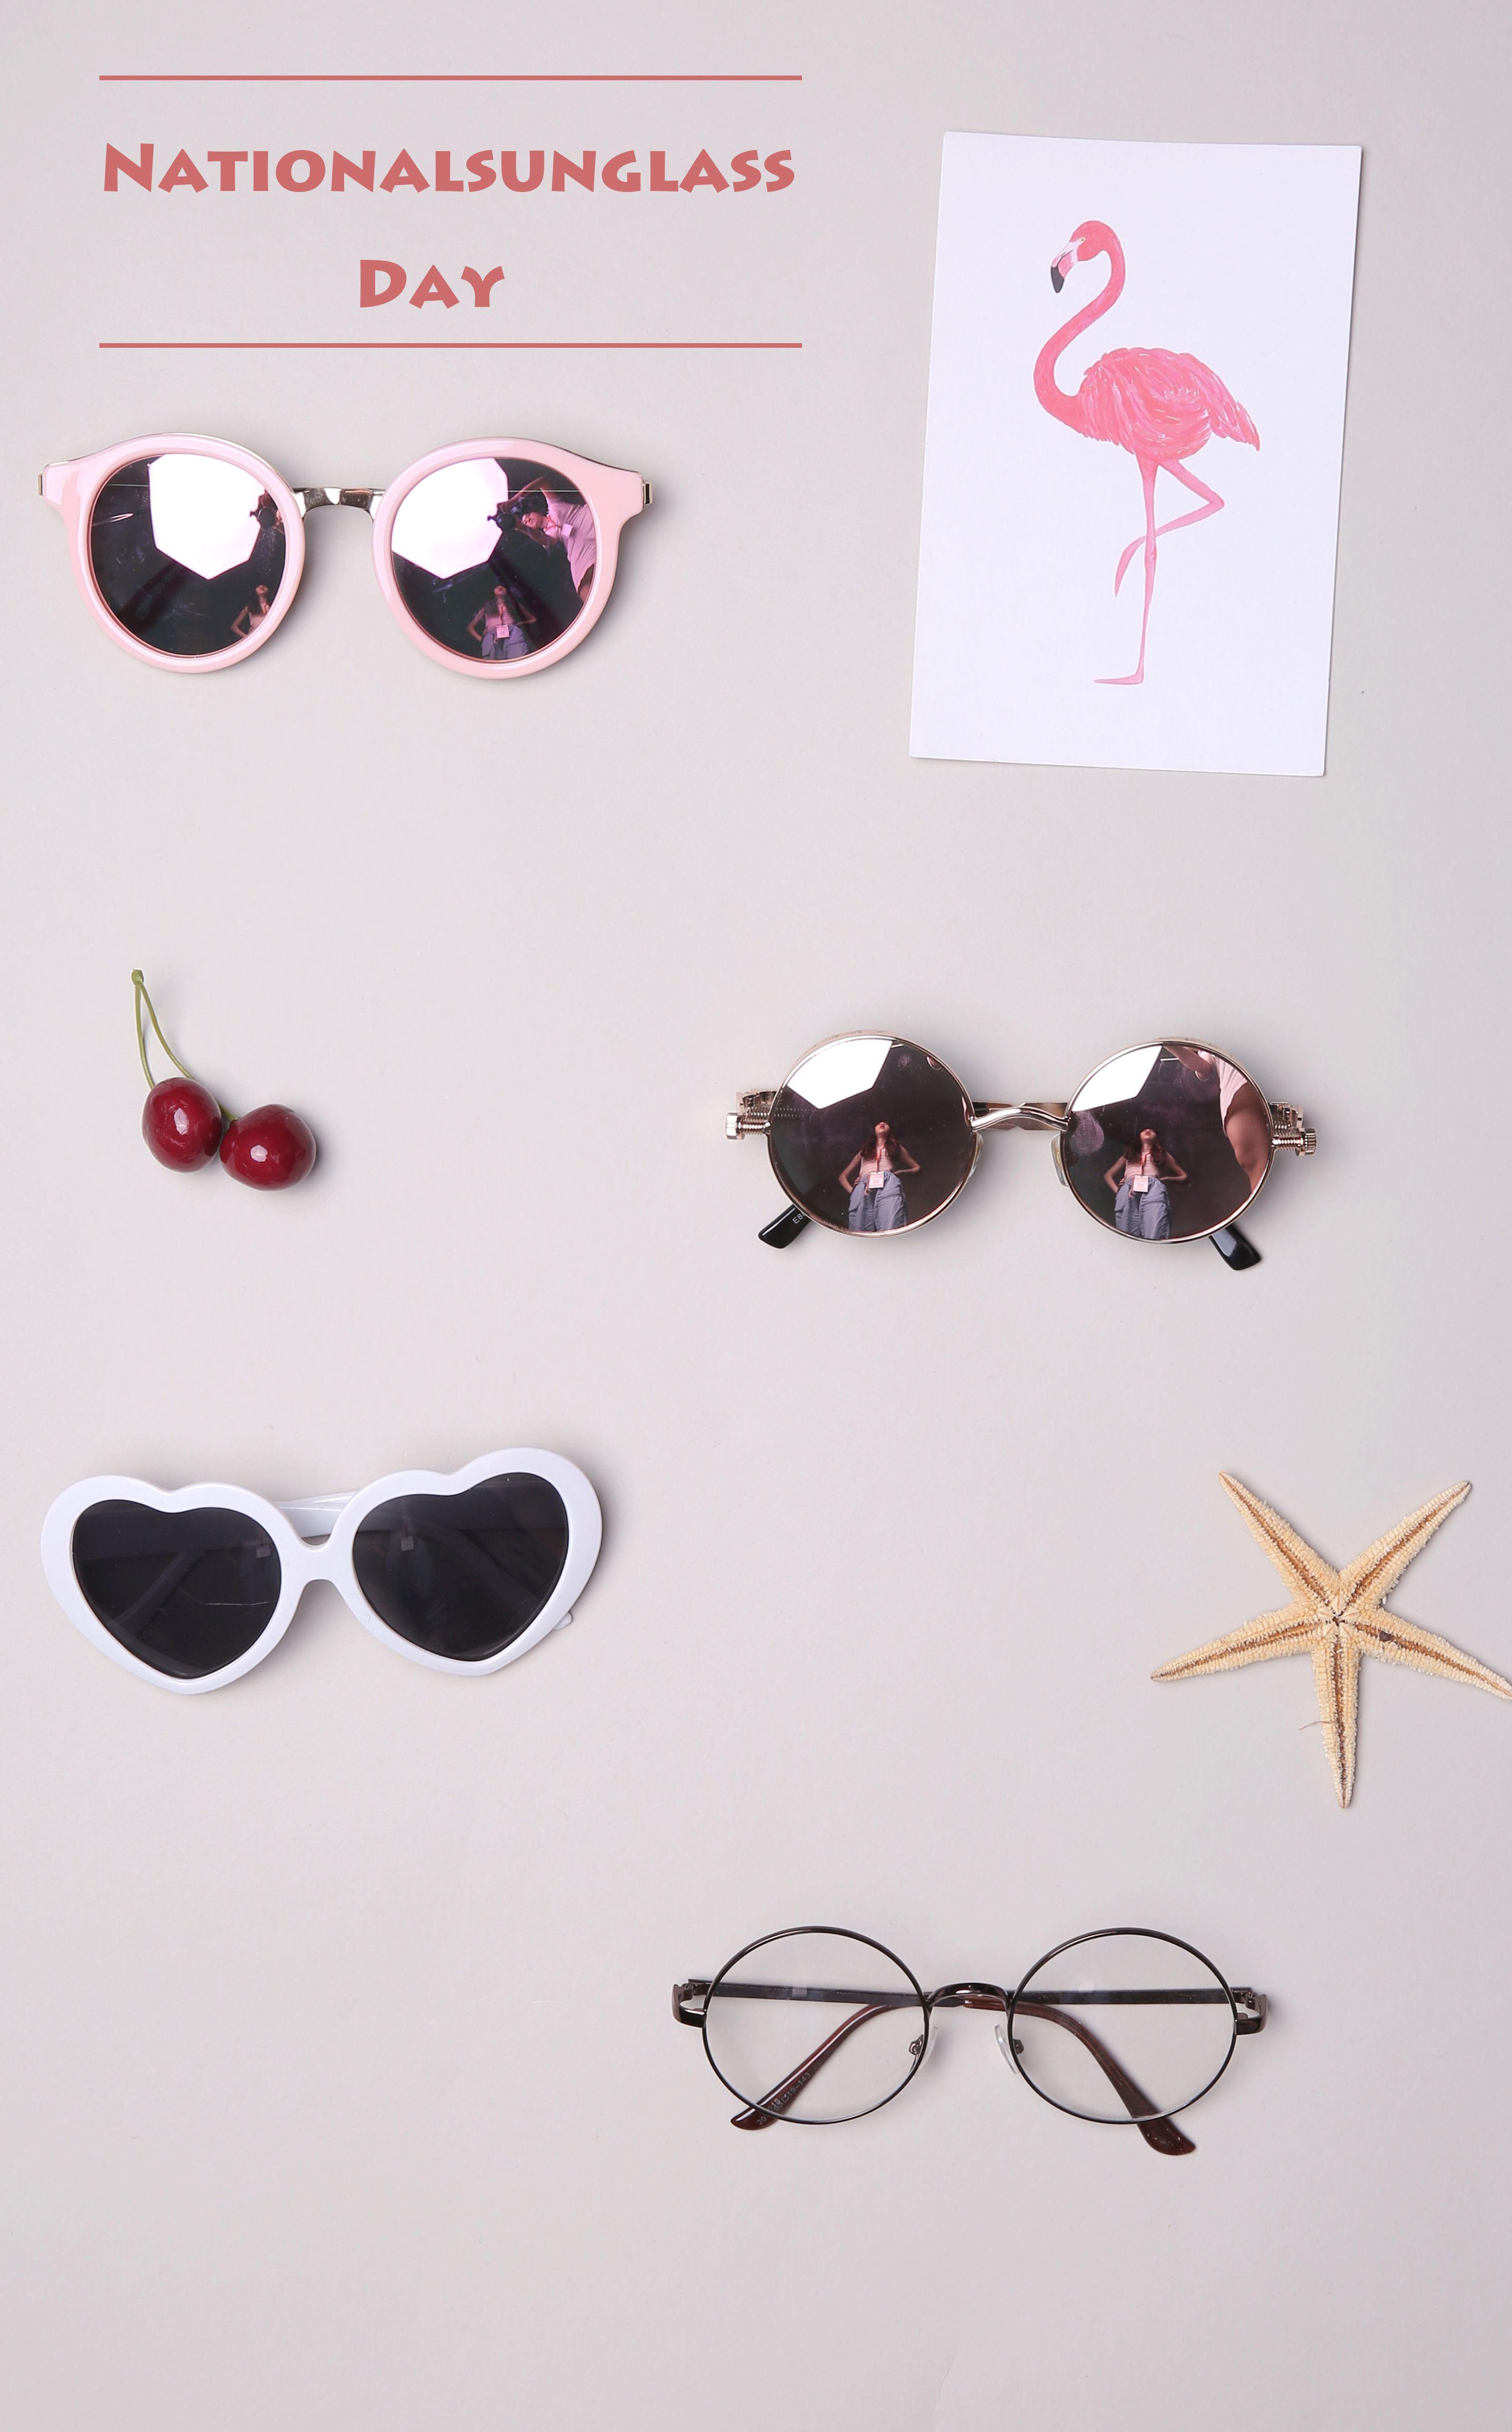 478a5733e0    3.86  Funny Retro Love Heart Shape Anti-UVA And UVB Sunglasses